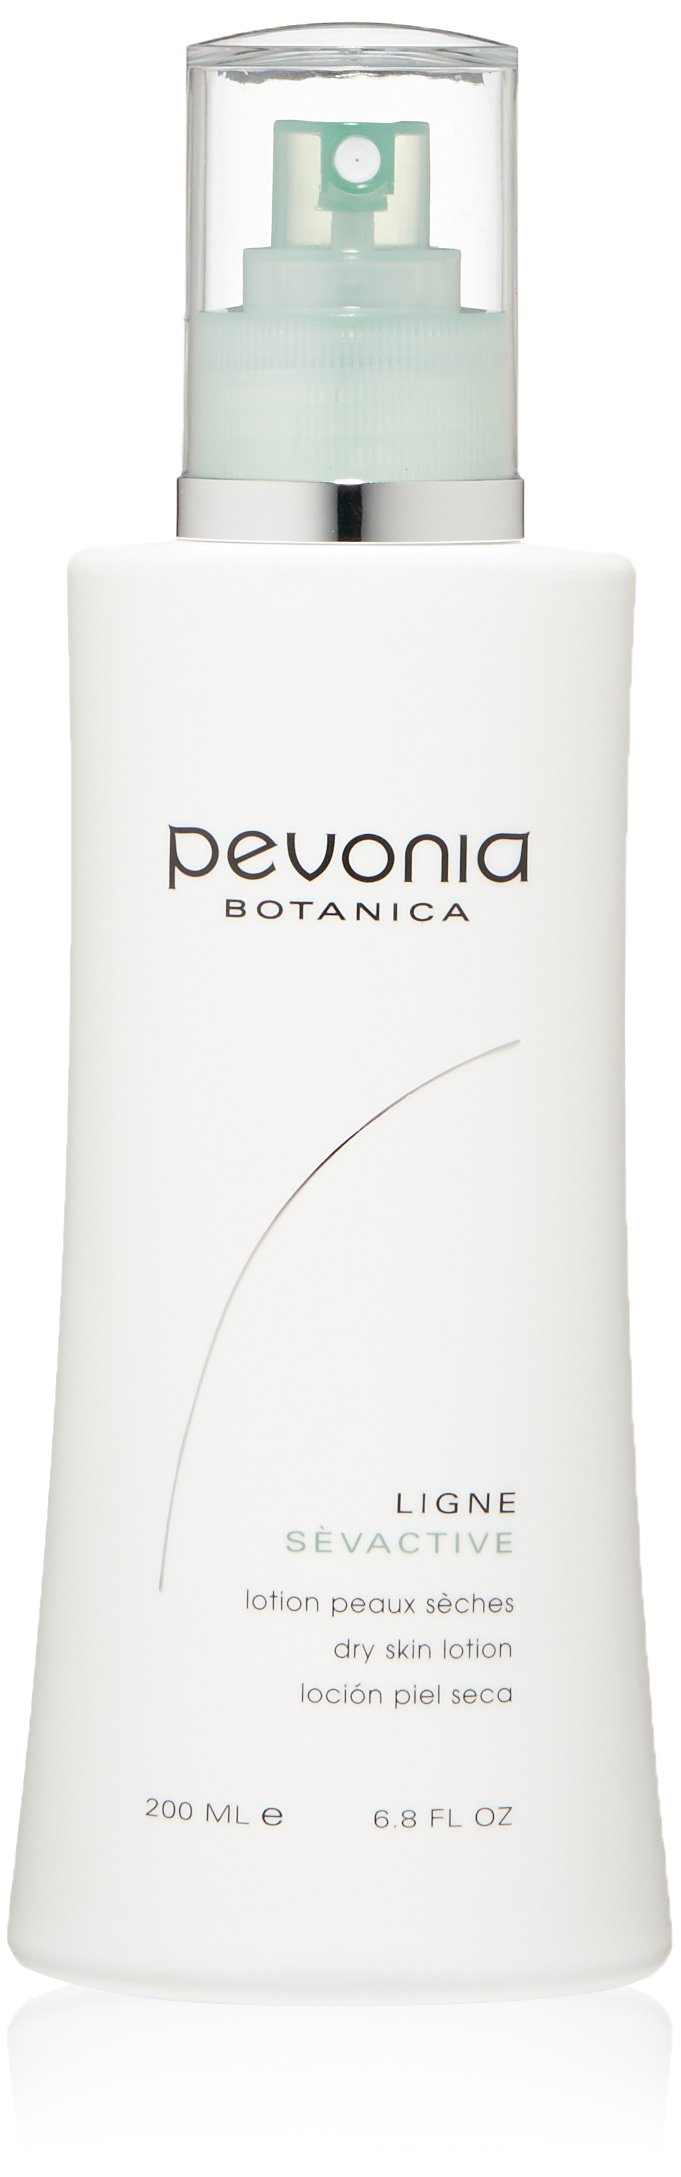 Pevonia Dry Skin Lotion, 6.8 Fl Oz by Pevonia Botanica